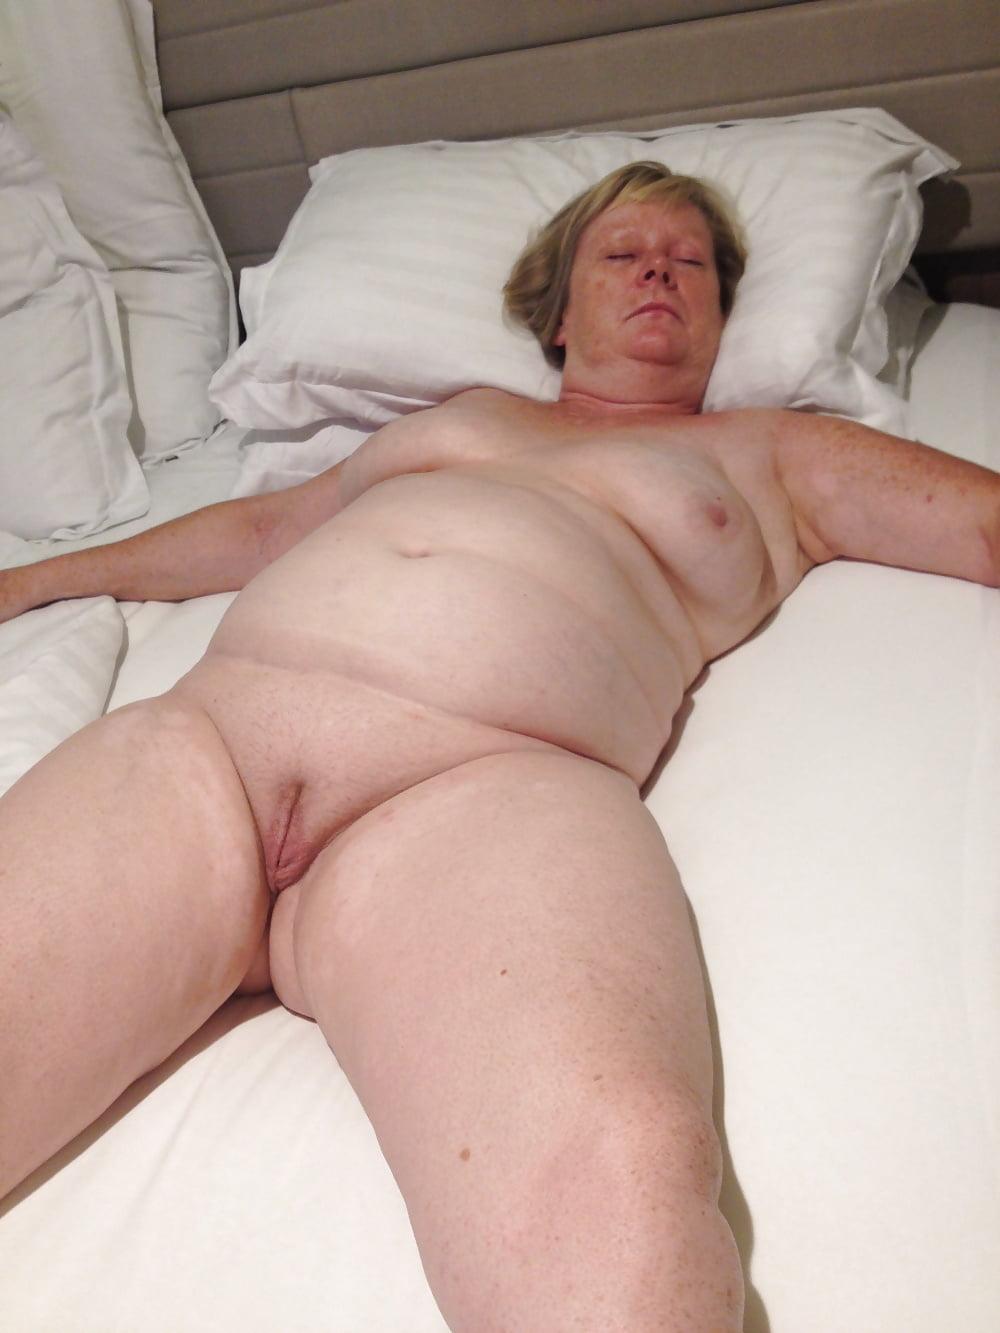 Sleeping granny porn, videos of masturbating girls